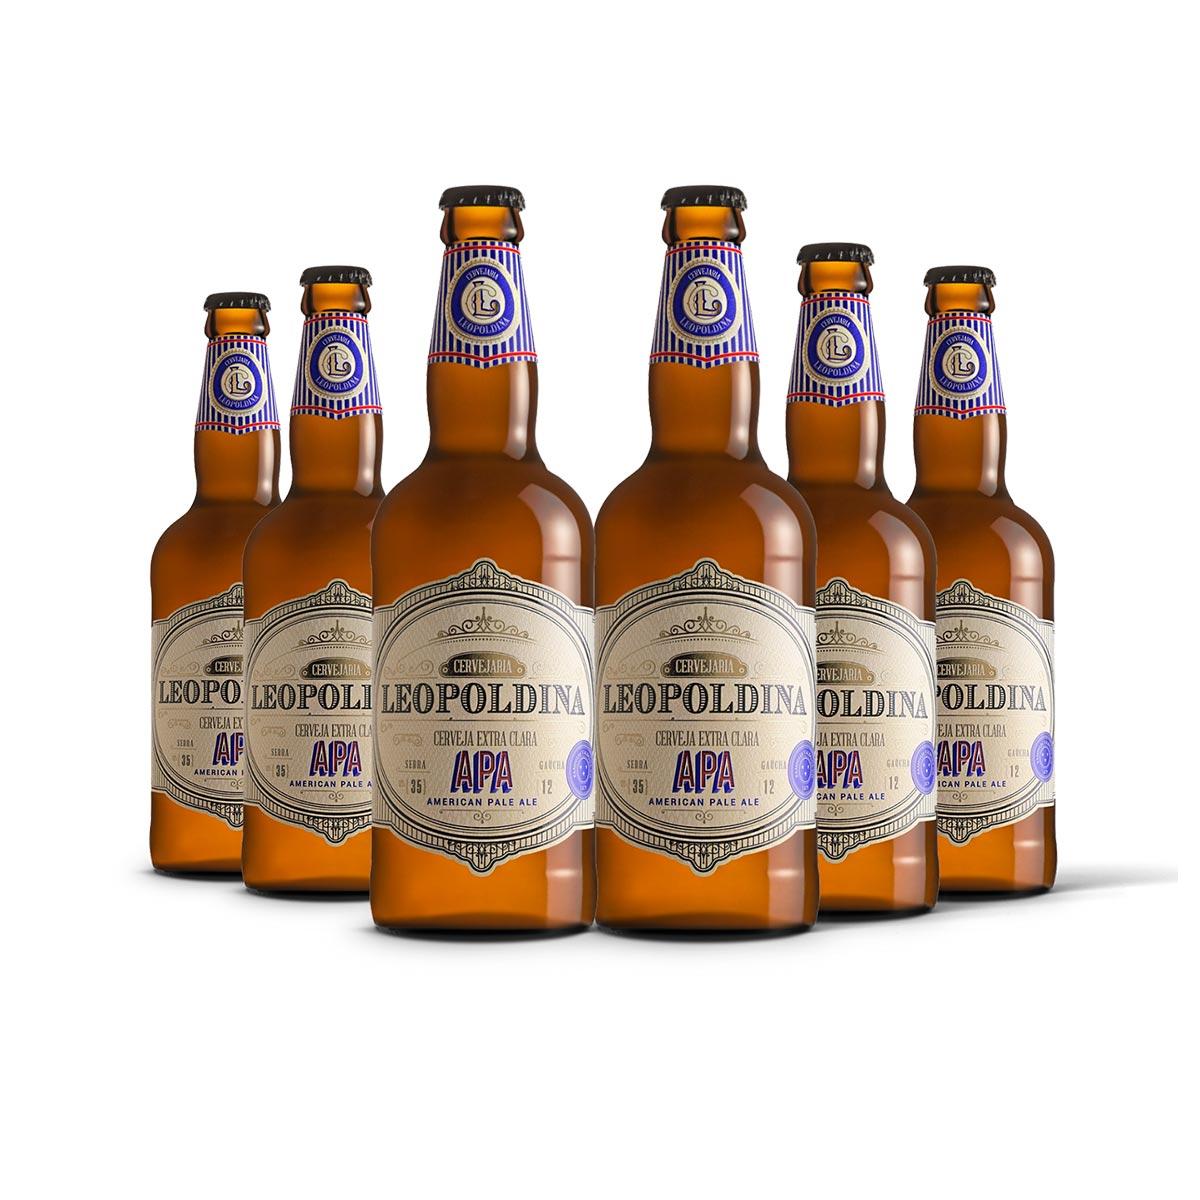 Pack Leopoldina American Pale Ale APA 6 cervejas 500ml